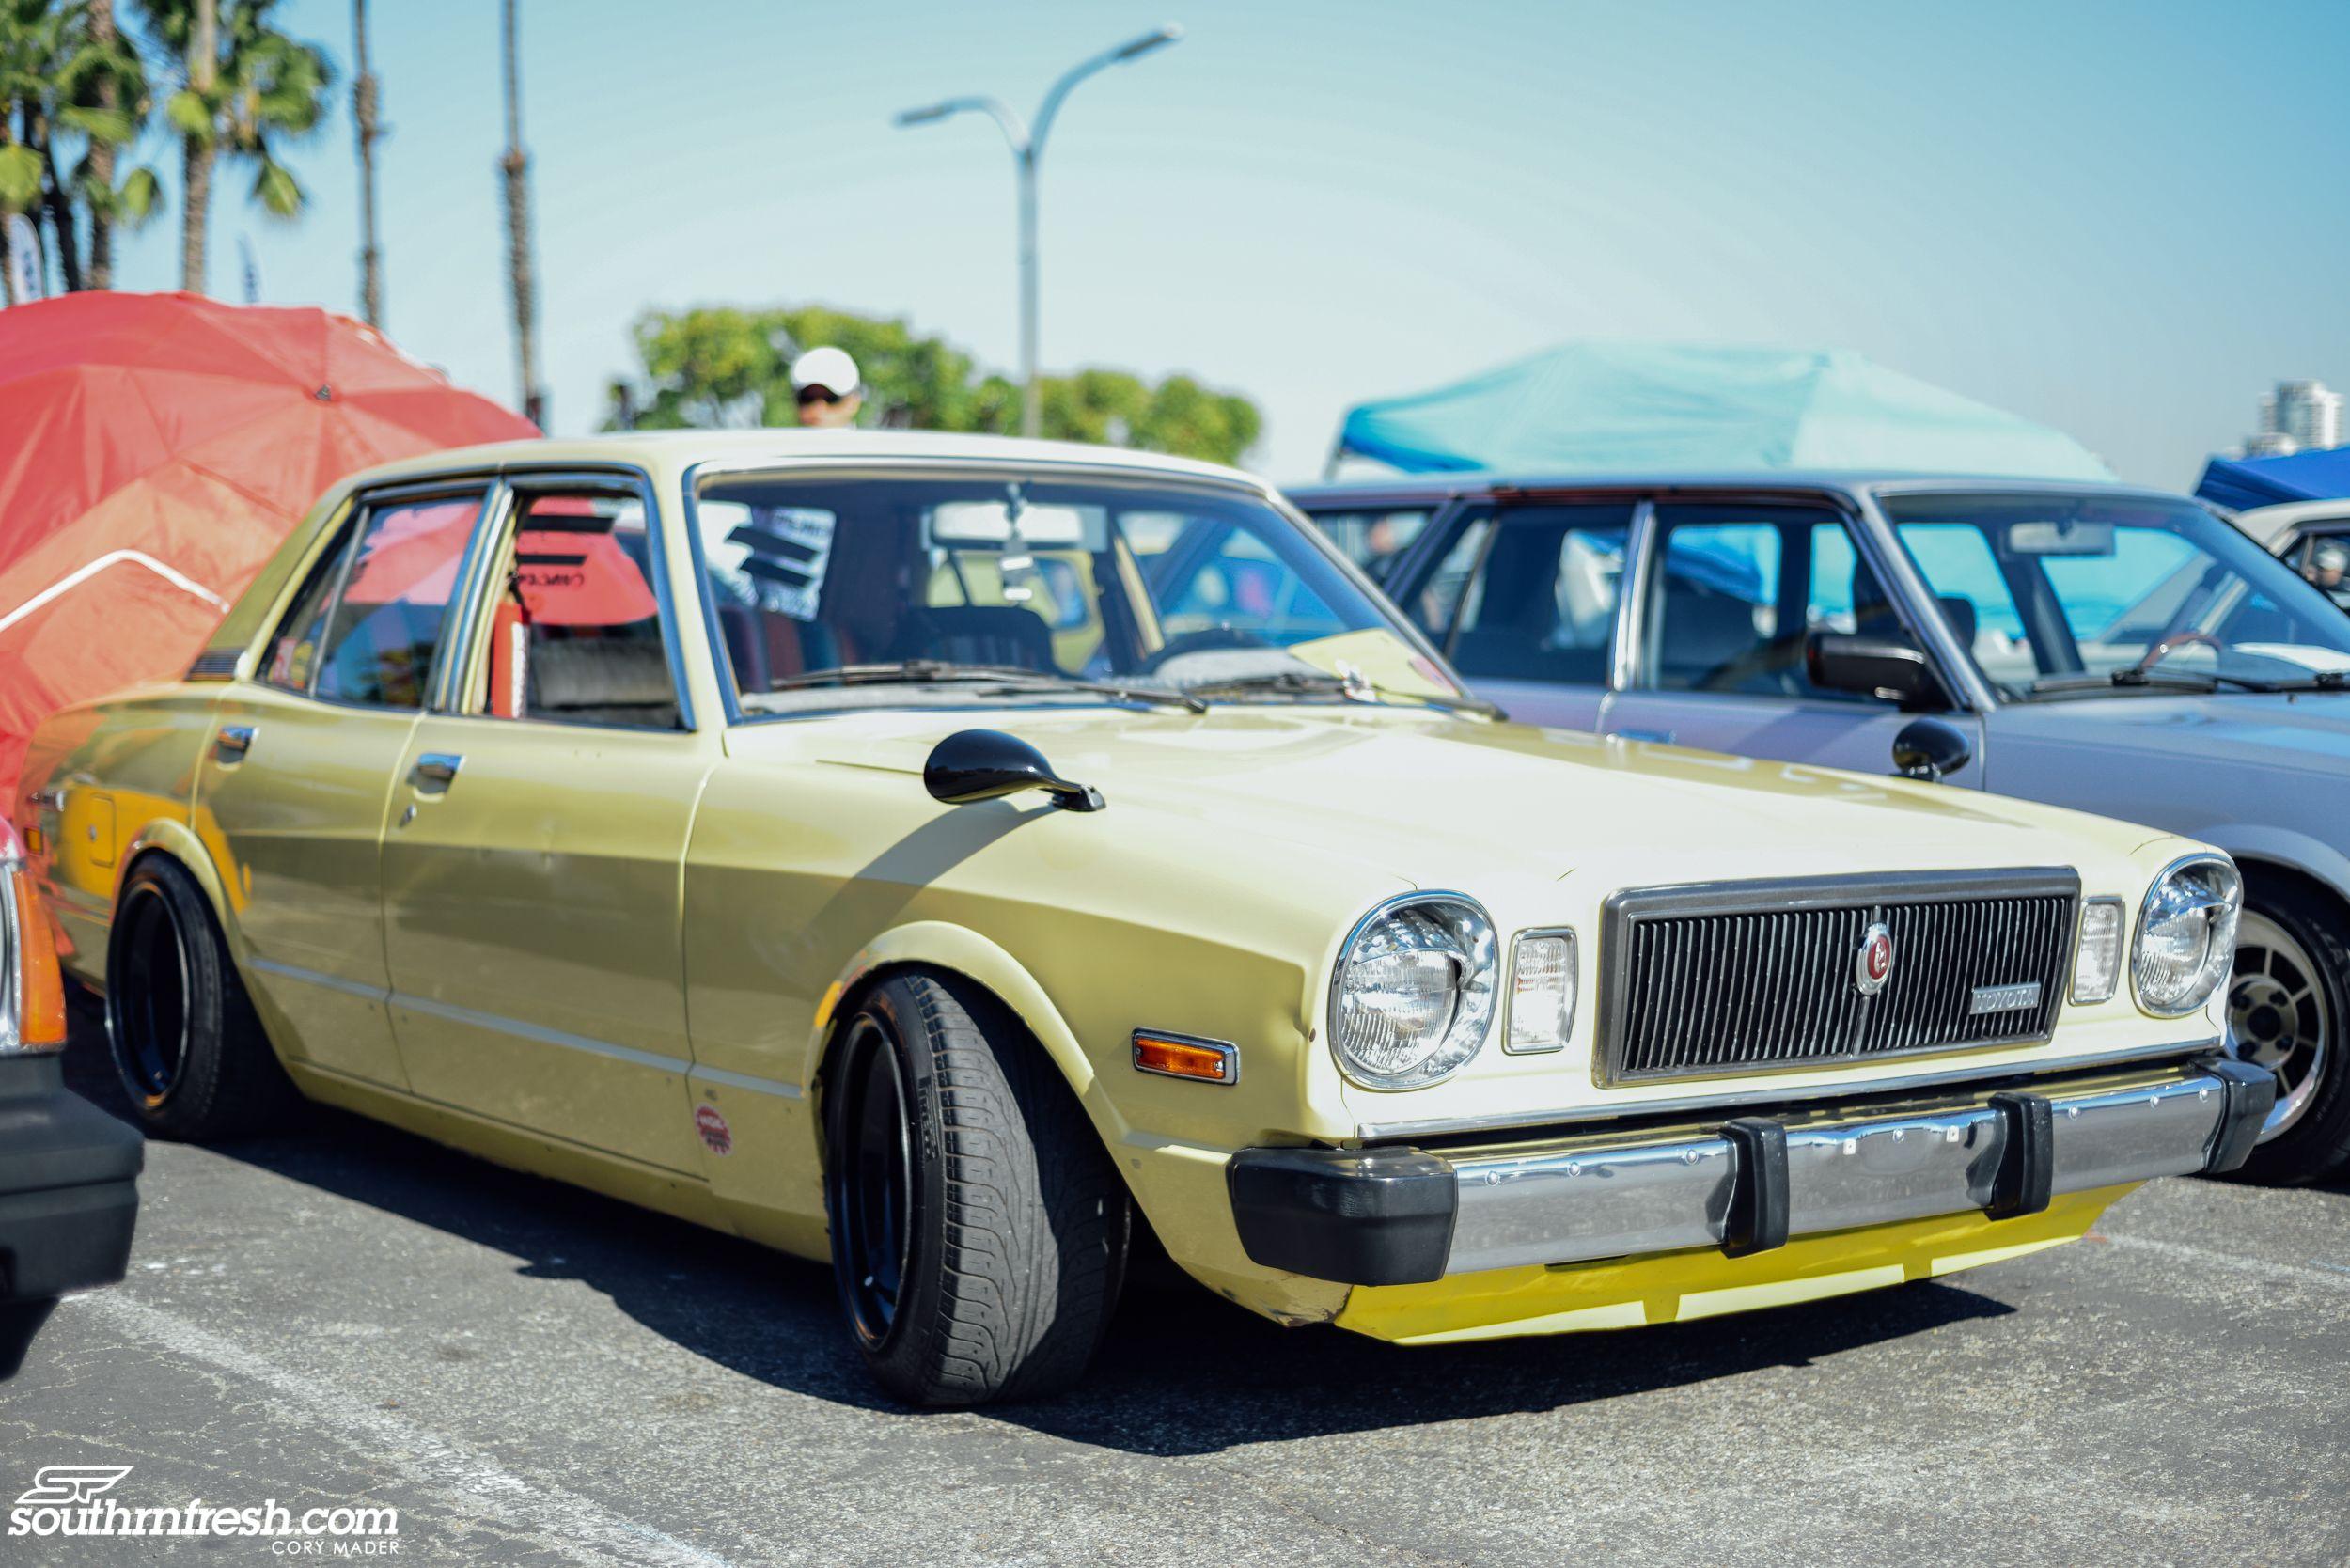 Japanese Classic Car Show In Long Beach SLEDGE HAMMER - Japanese classic car show